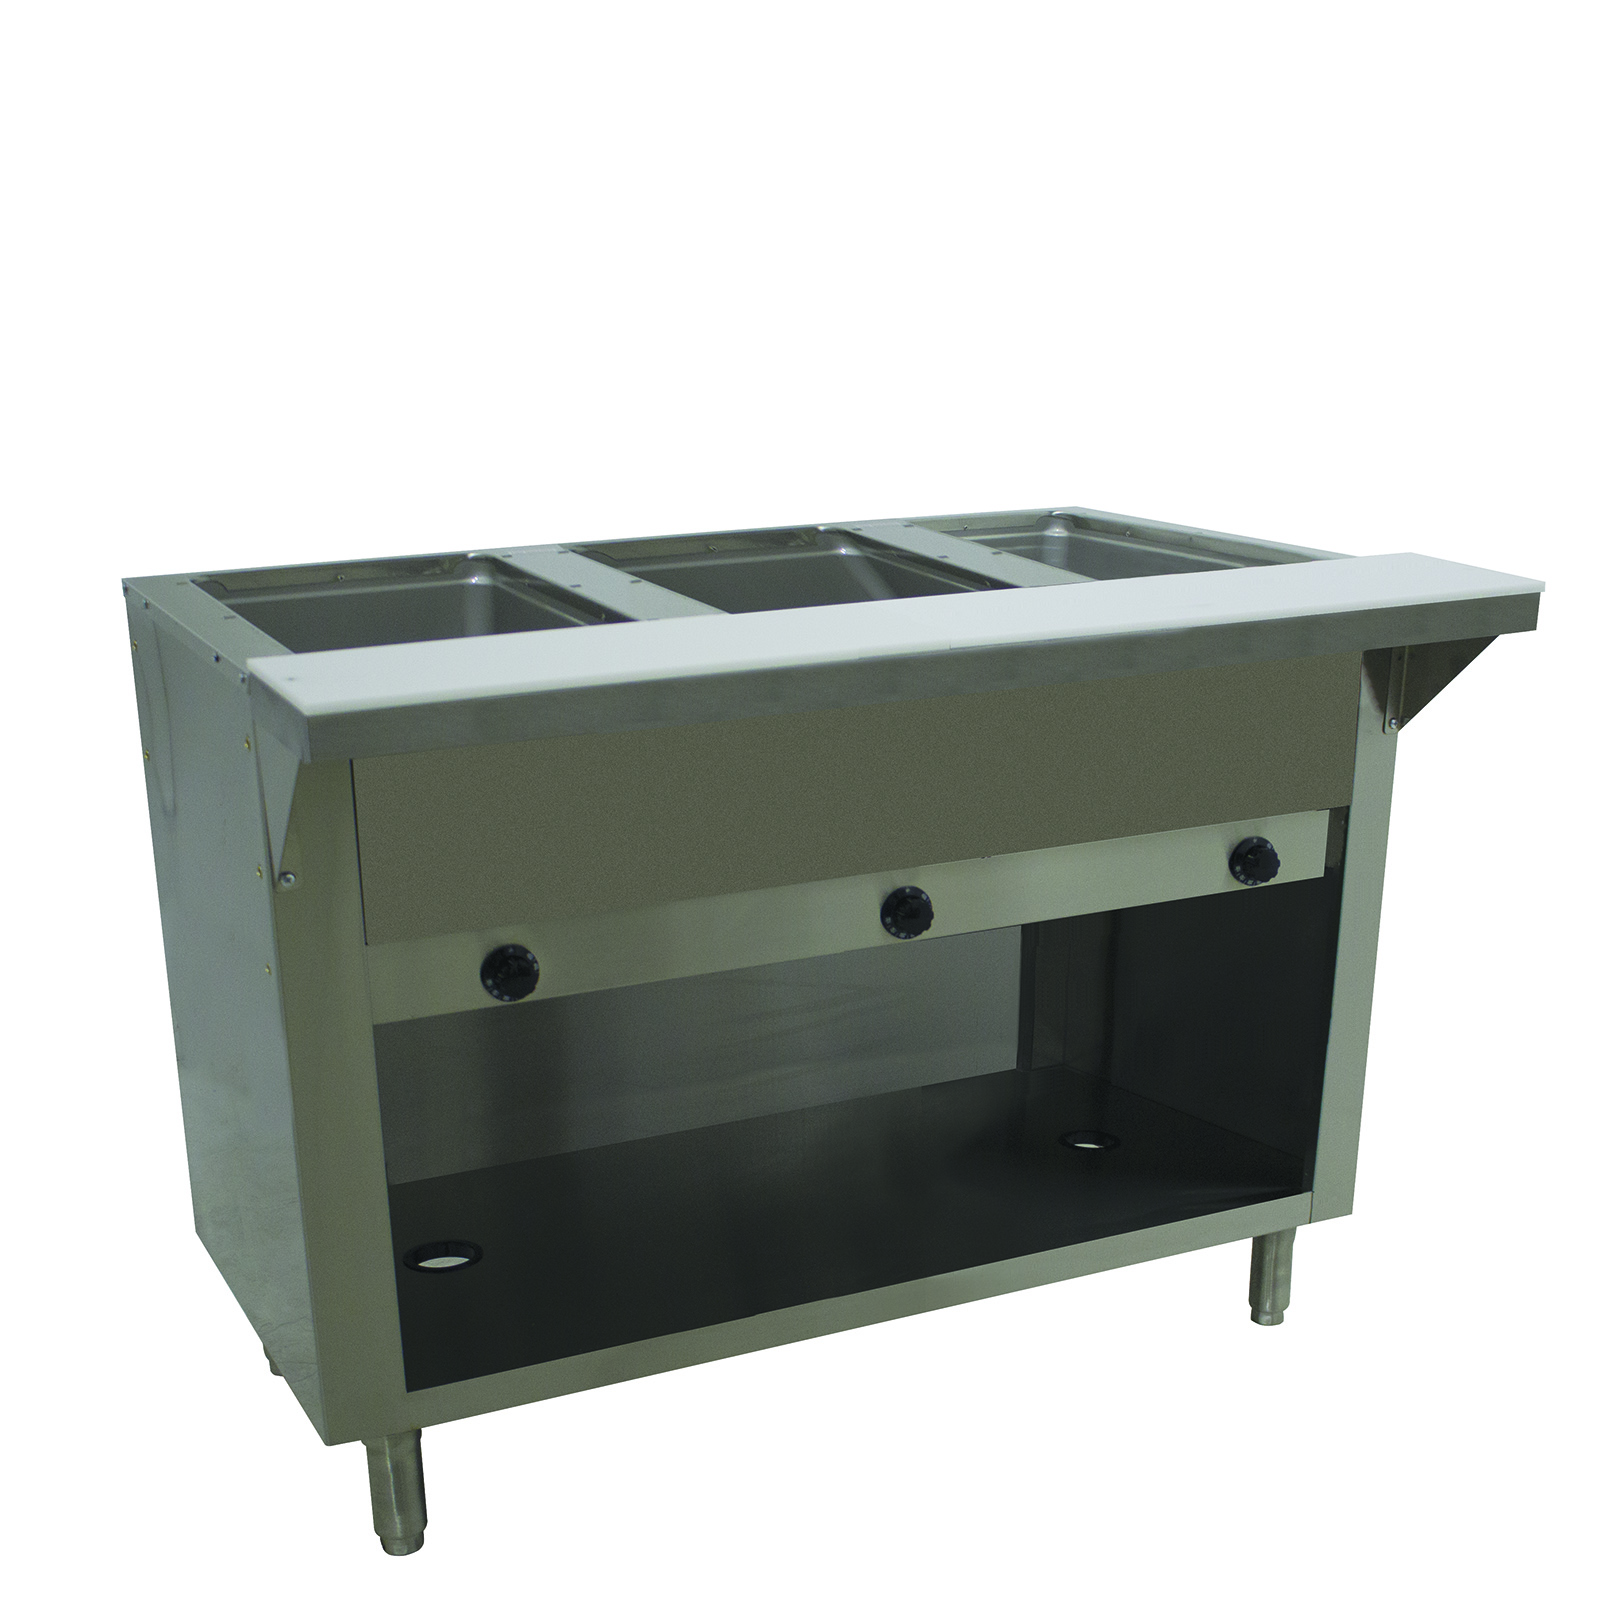 Advance Tabco HF-3G-NAT-BS serving counter, hot food, gas